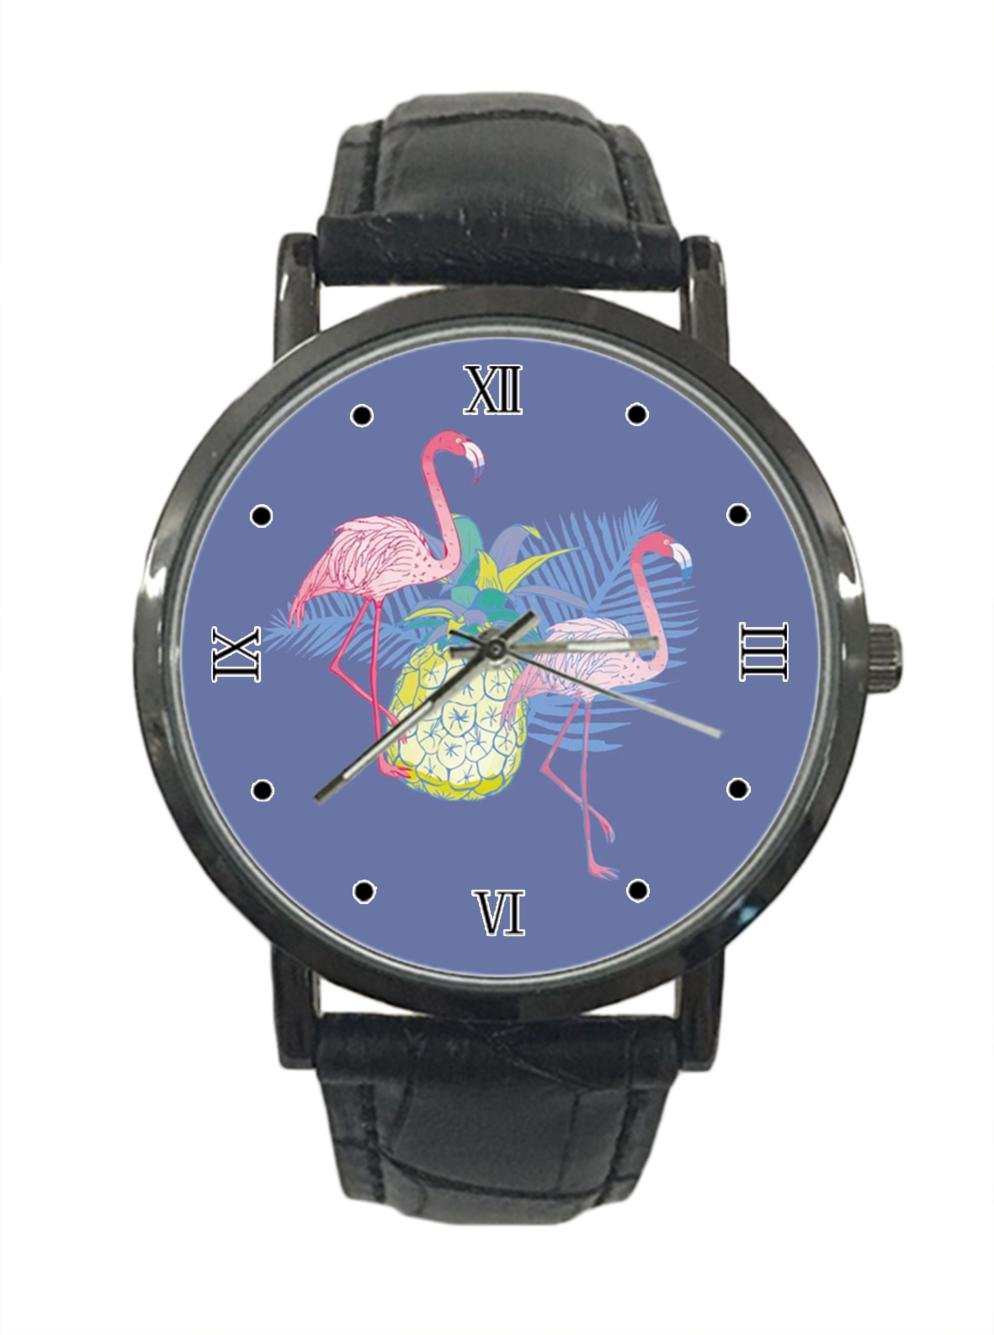 jkfgweeryhrt New Simple Fashion Pink Flamingo Stainless Steel Leather Analog Quartz Sport Wrist Watch